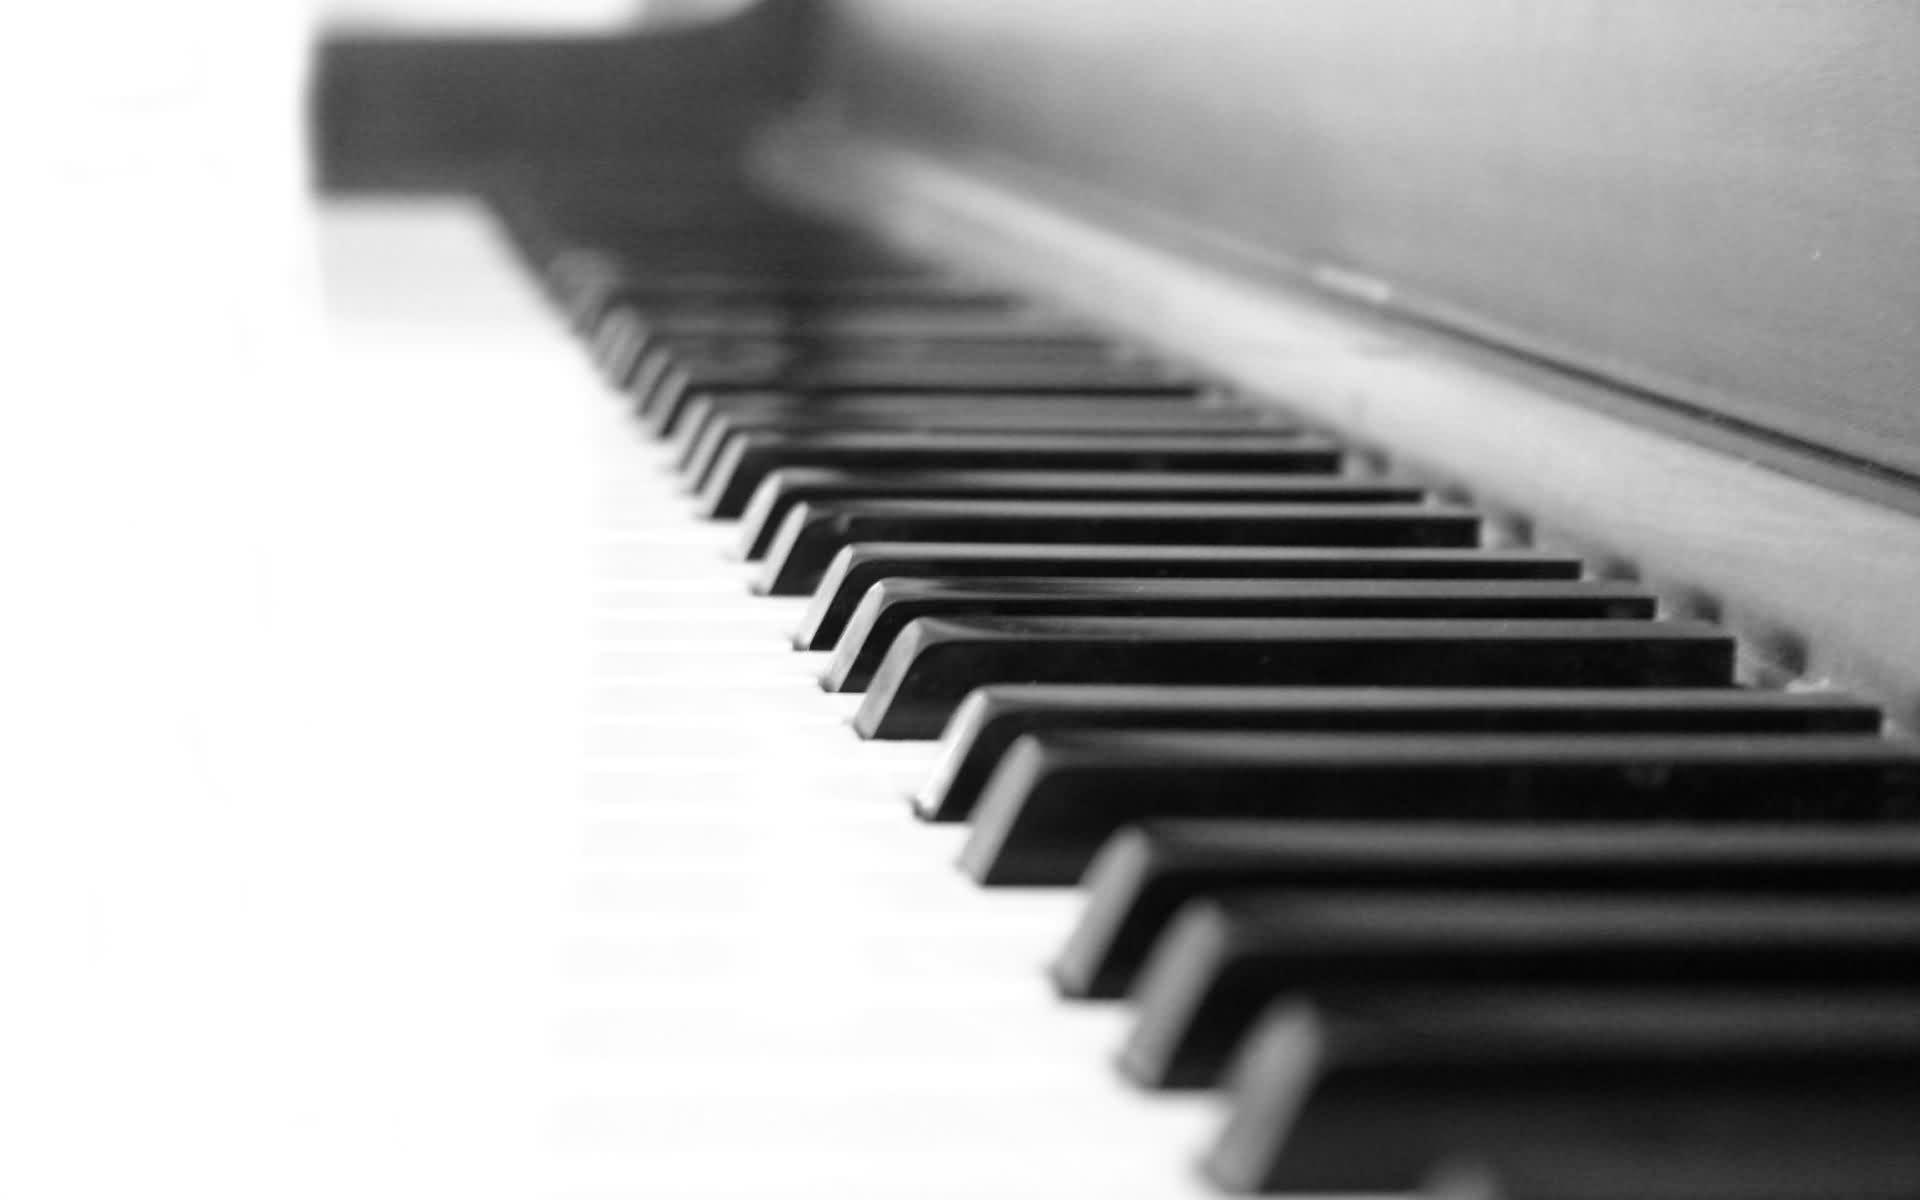 piano keys desktop wallpaper 58725